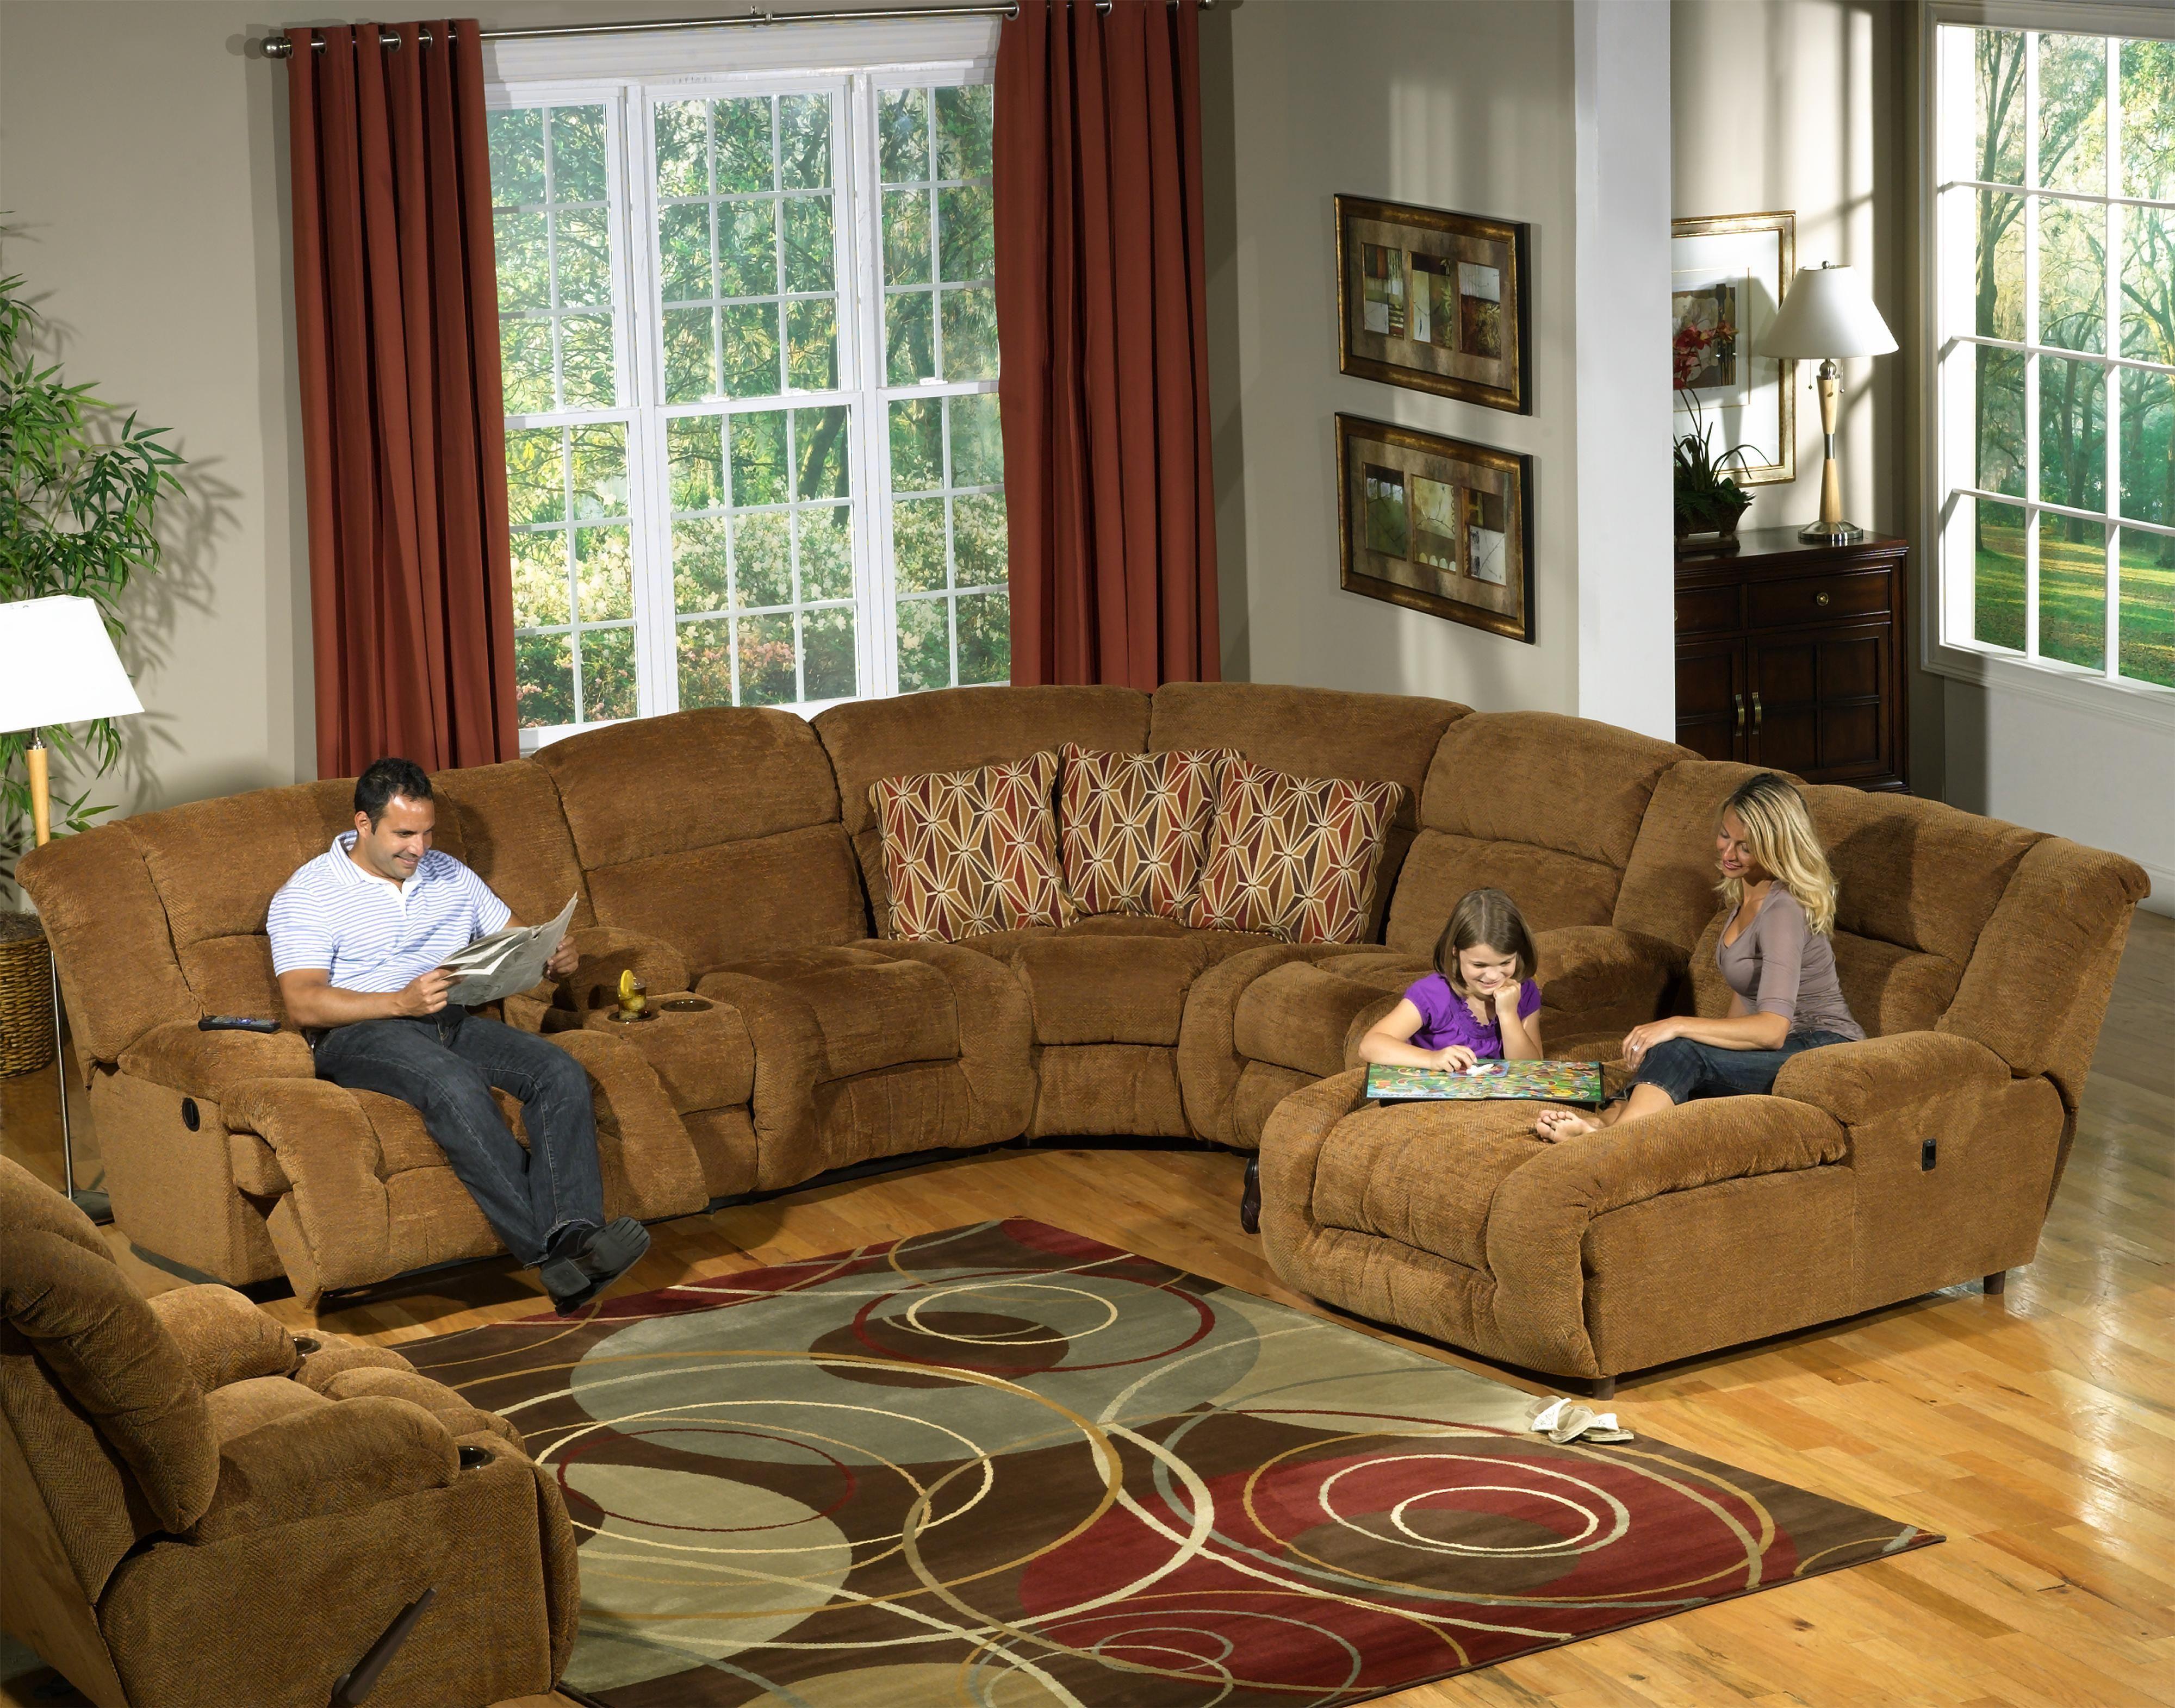 Enterprise (185) By Catnapper   Knoxville Wholesale Furniture   Catnapper  Enterprise Dealer Tennessee